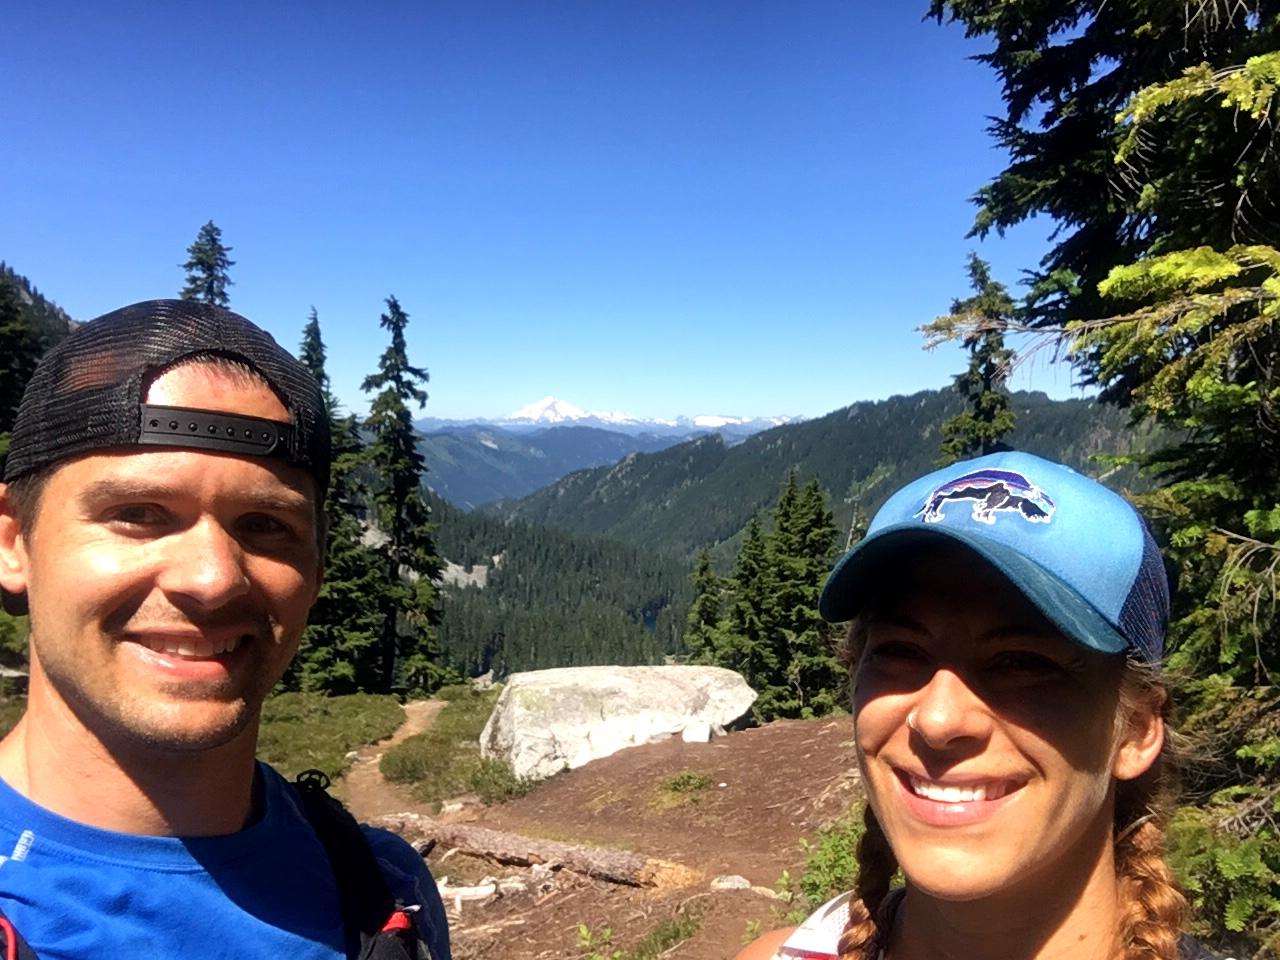 Emily & Joe on Stevens Pass to Snoqualmie Pass adventure